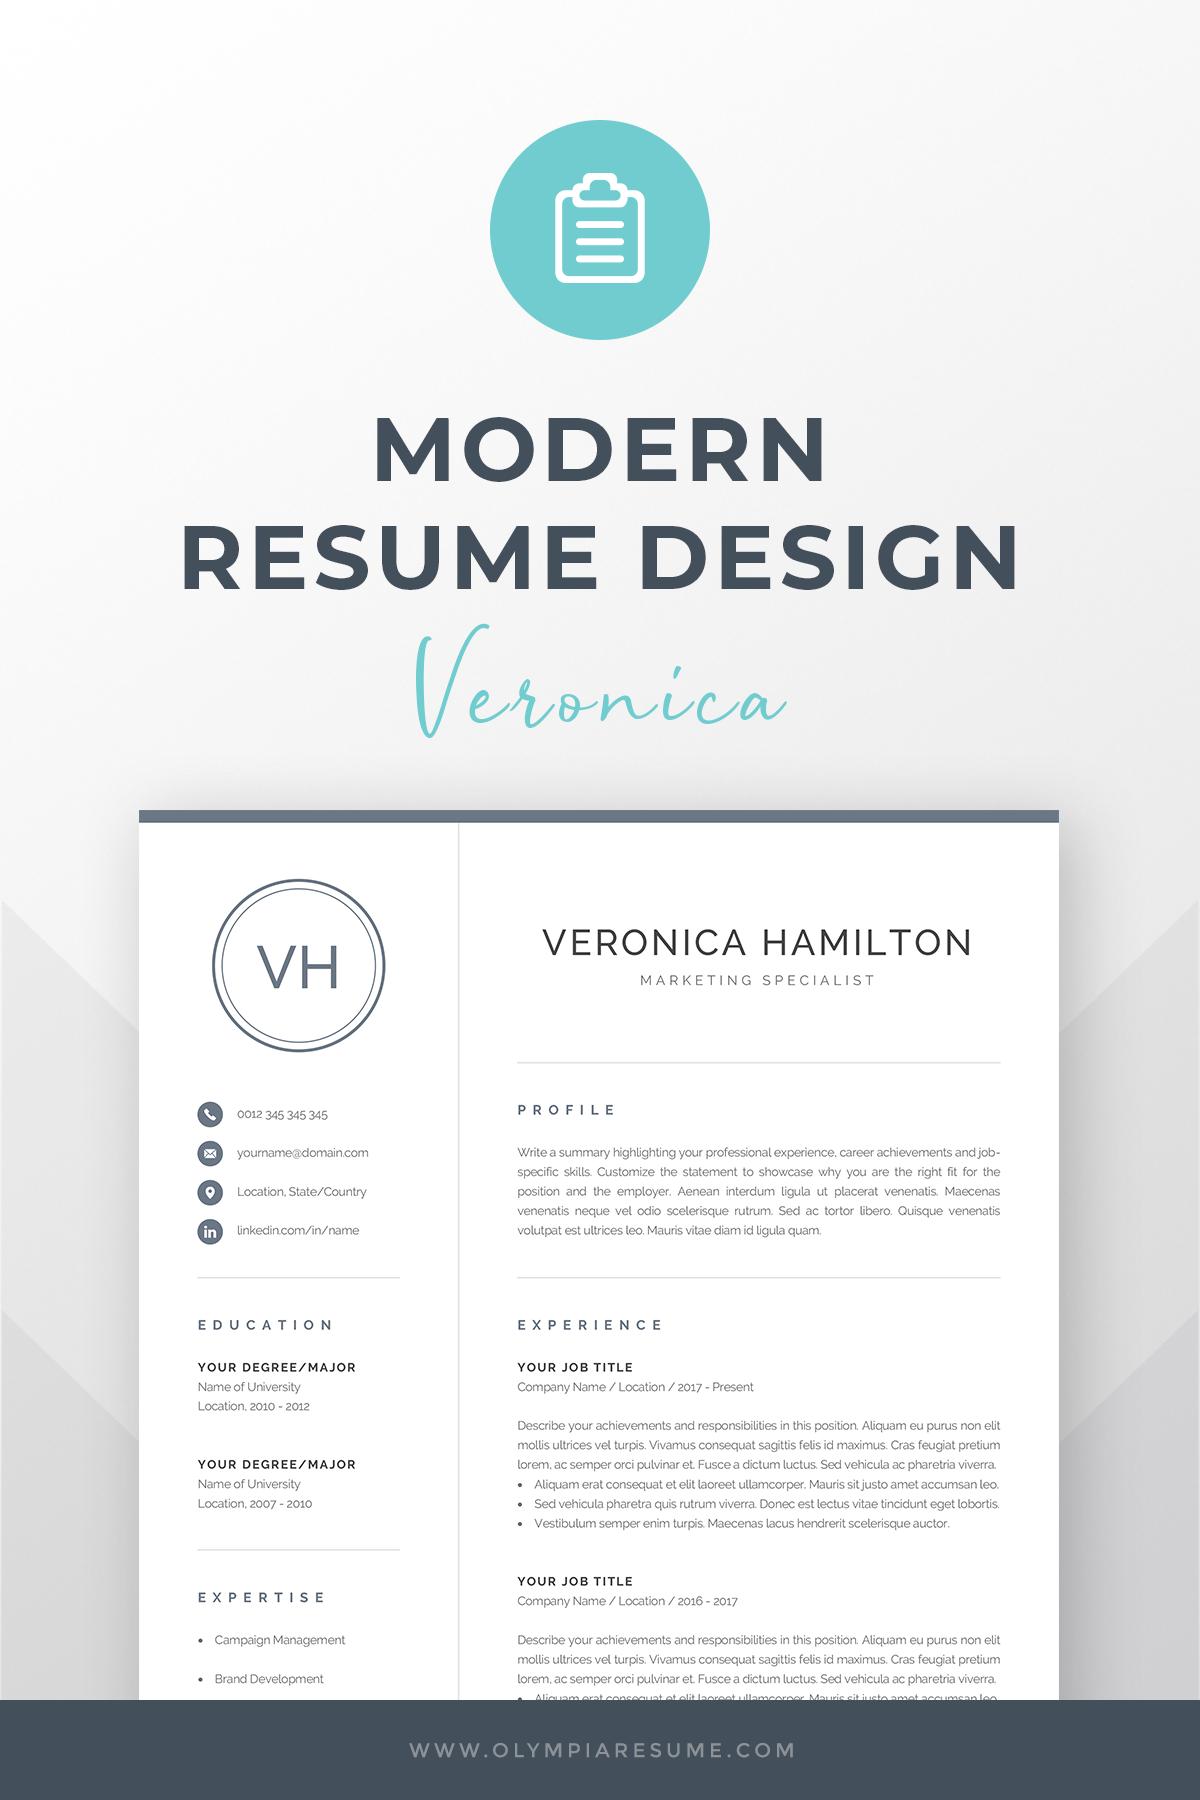 Resume Template With Monogram 1 2 Page Resume Modern Etsy Resume Template Word Creative Cv Template One Page Resume Template